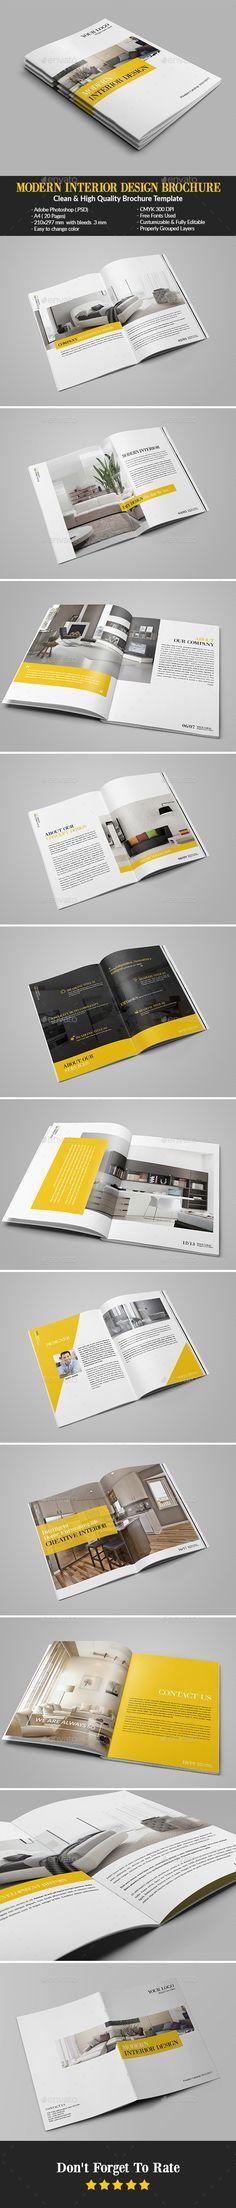 Modern Interior Design Brochure / Catalog Template PSD. Download here: http://graphicriver.net/item/modern-interior-design-brochurecatalog/14865053?ref=ksioks